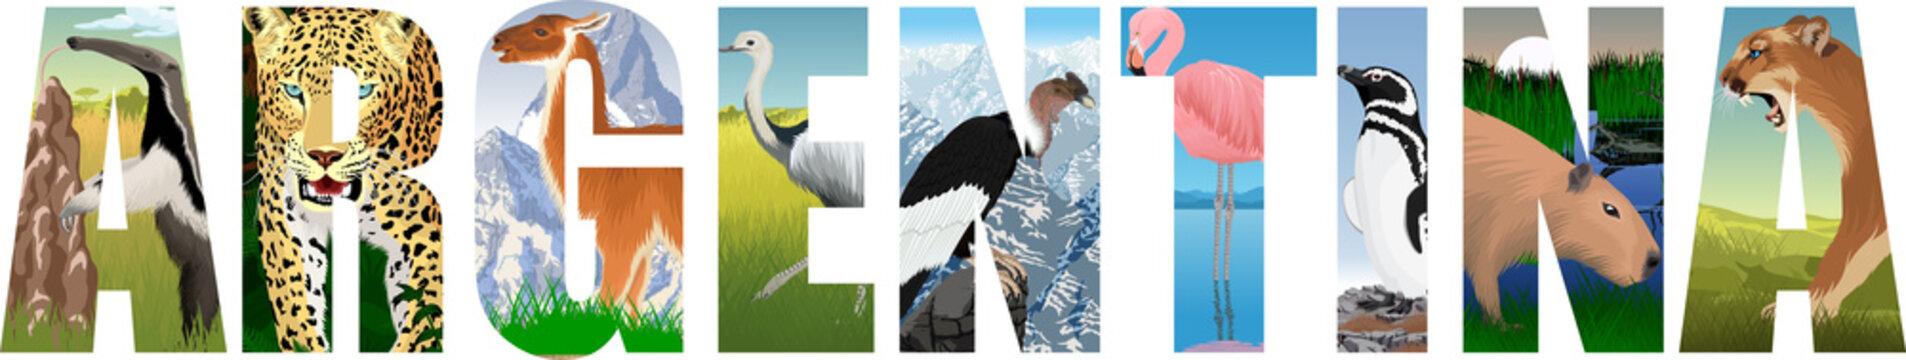 vector set of Argentina word with animals: anteater, jaguar, lama, greater rhea, Andean condor , Pink flamingo, Magellanic penguin, Capybara and puma